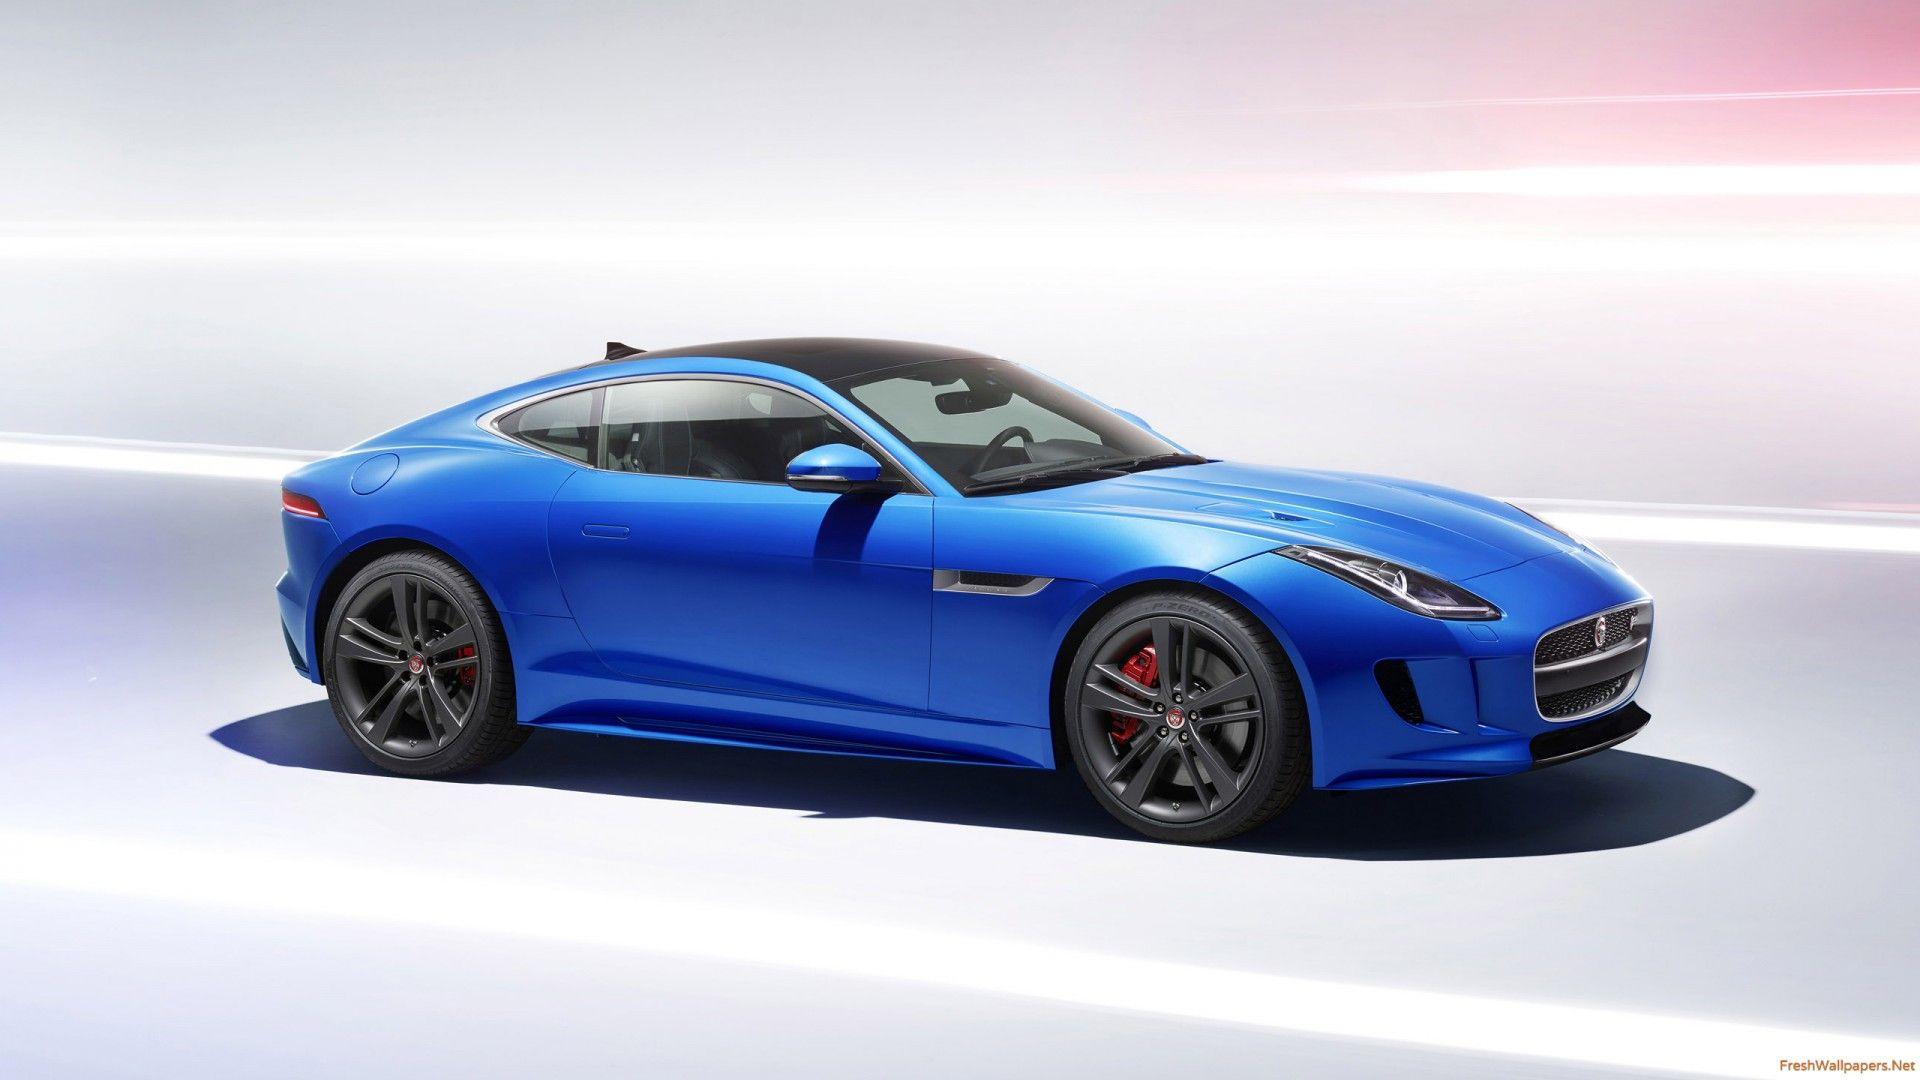 2017 Jaguar F Type Coupe British Design Edition Jaguar F Type Jaguar New Cars